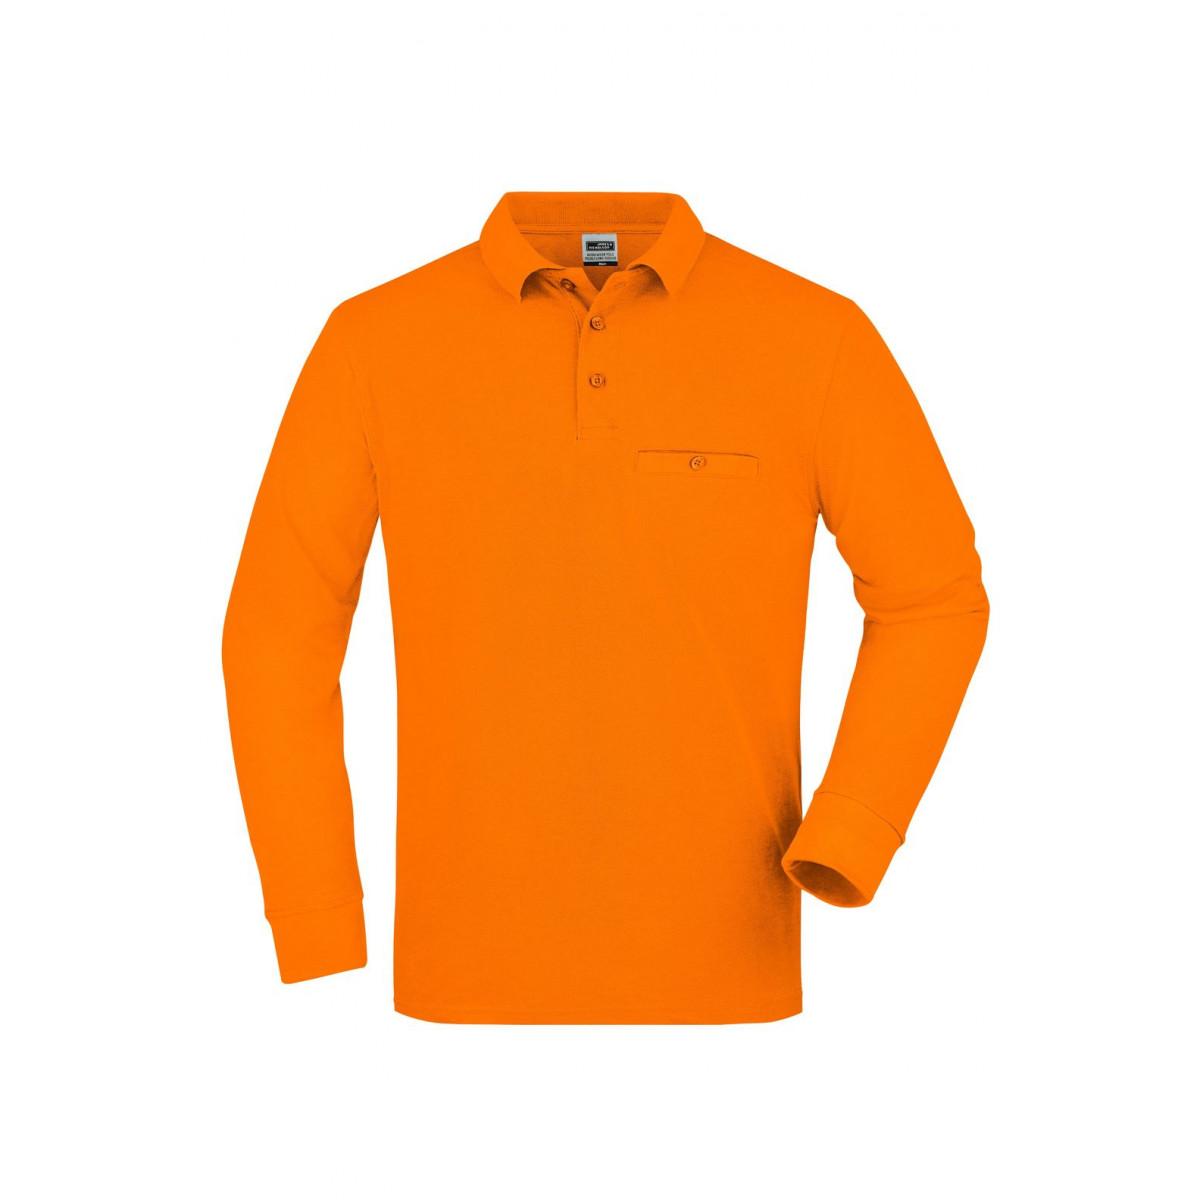 Рубашка поло мужская JN866 Mens Workwear Polo Pocket Longsleeve - Оранжевый